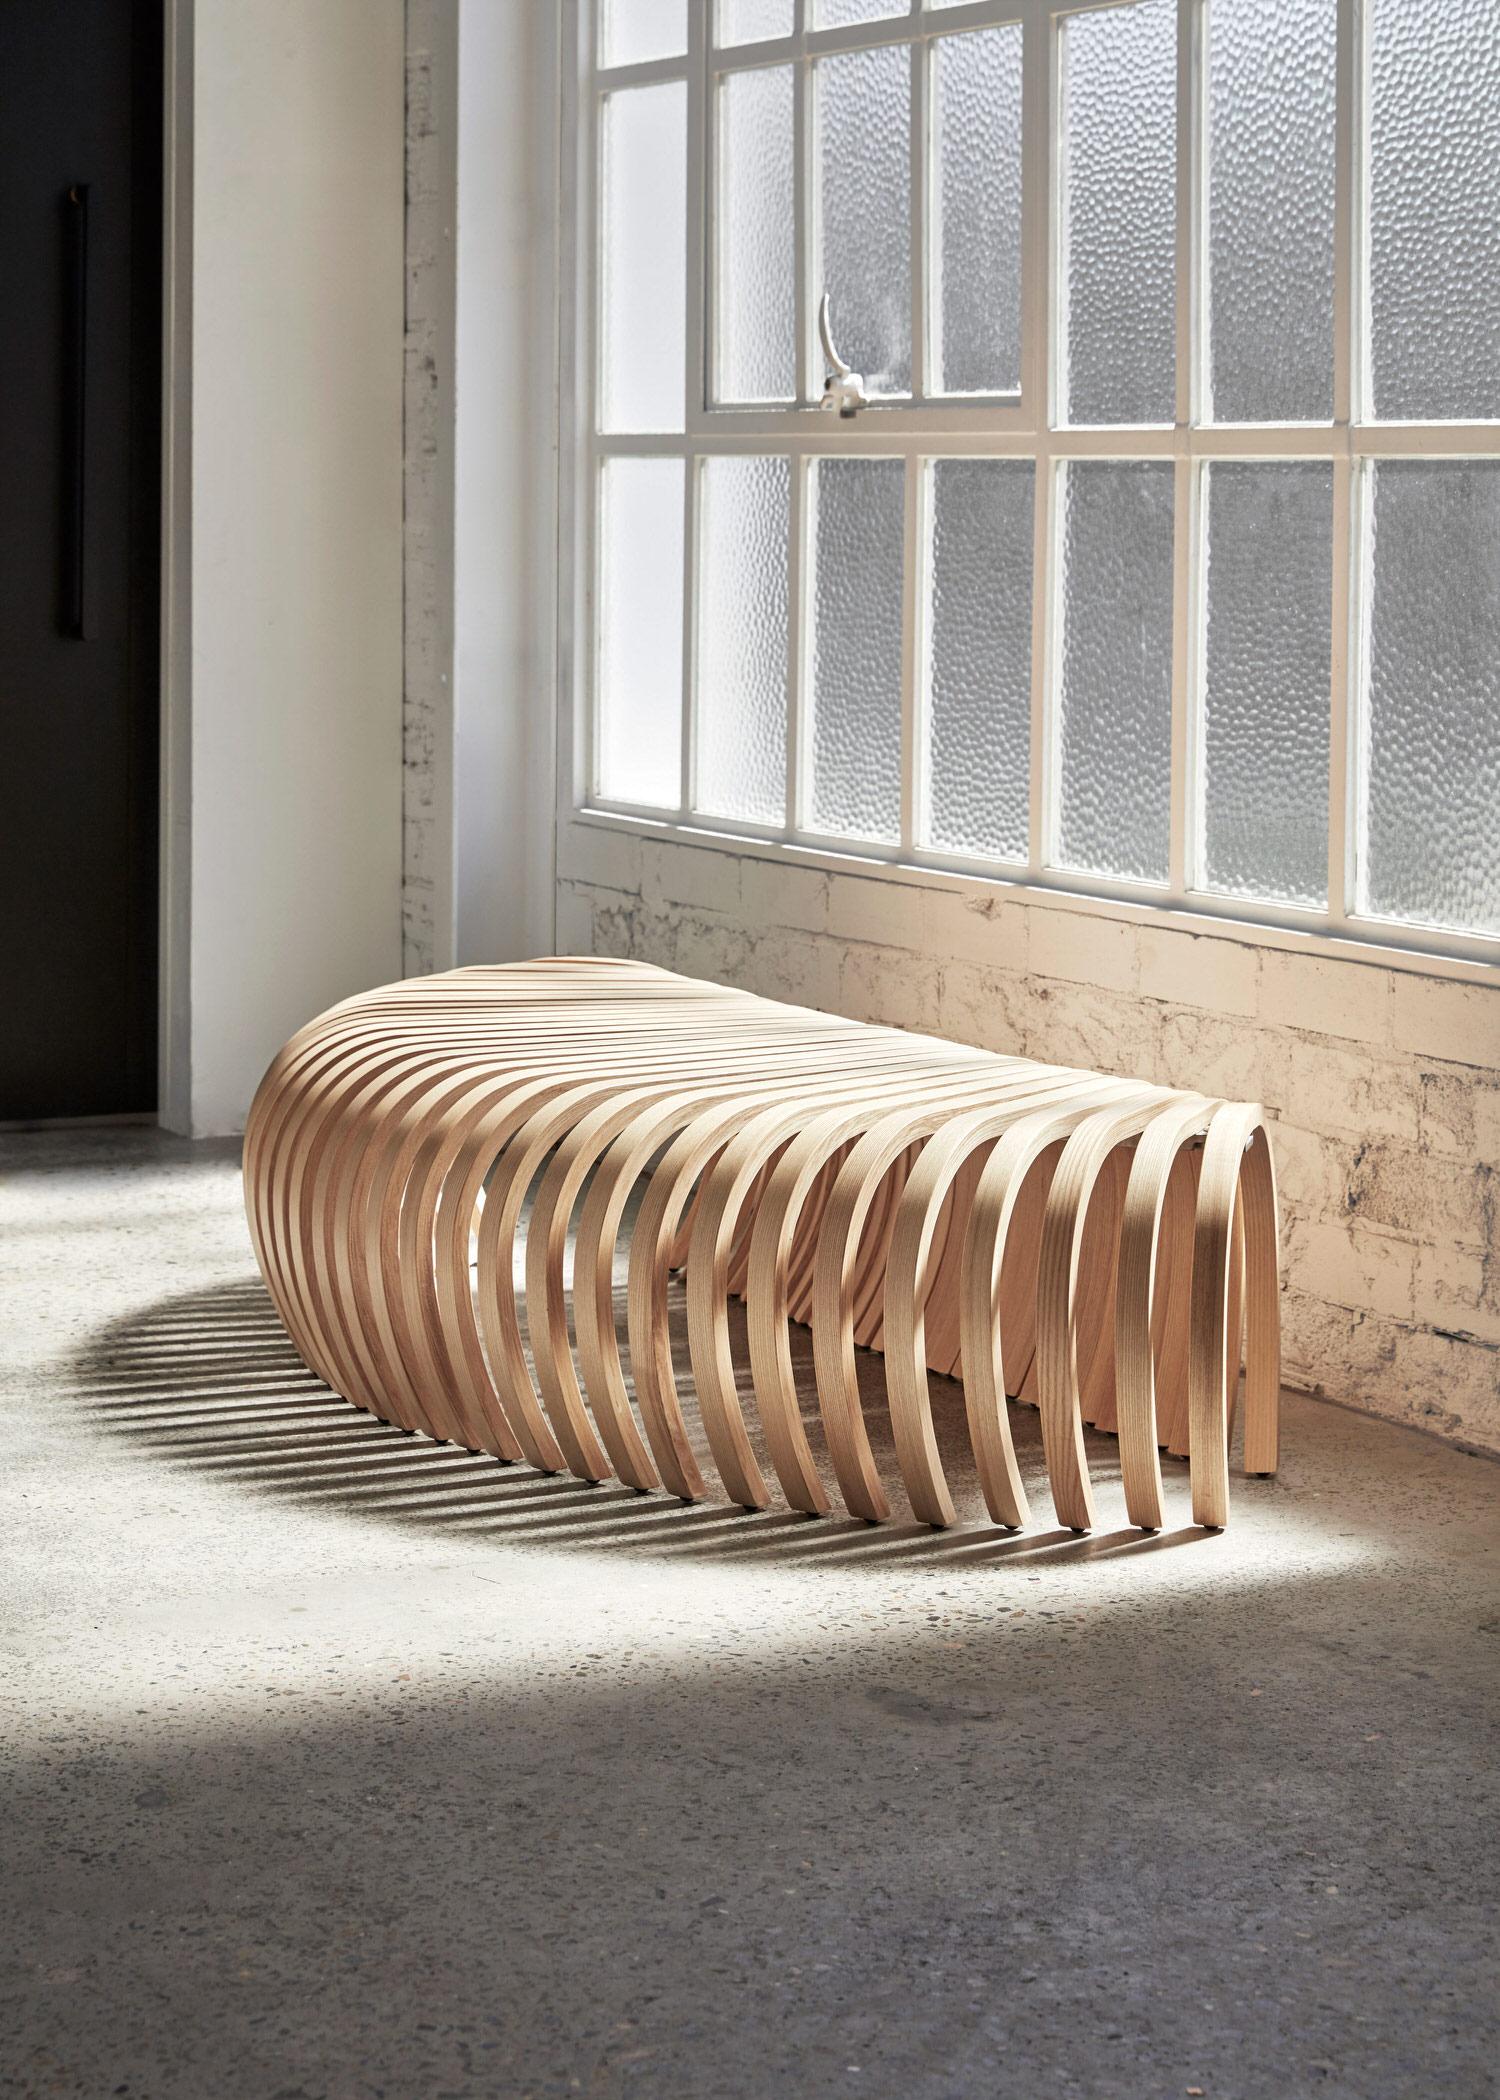 DesignByThem Ribs Bench Ash Timber, Australian Design   Yellowtrace